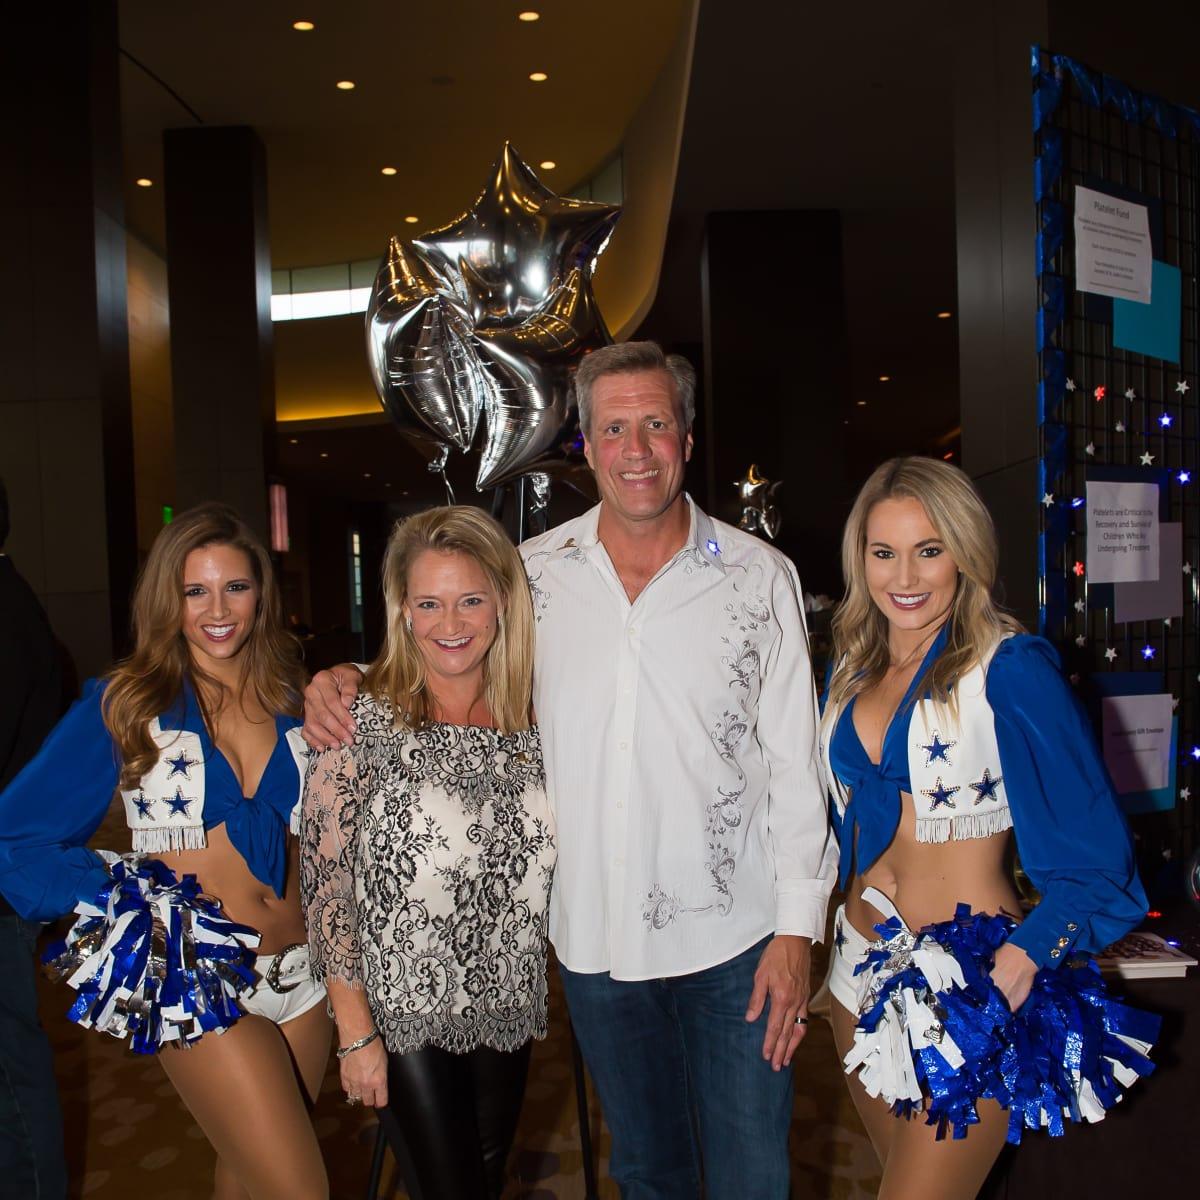 Valeria & Jeff Jones with the Dallas Cowboys Cheerleaders , EUTS 2017